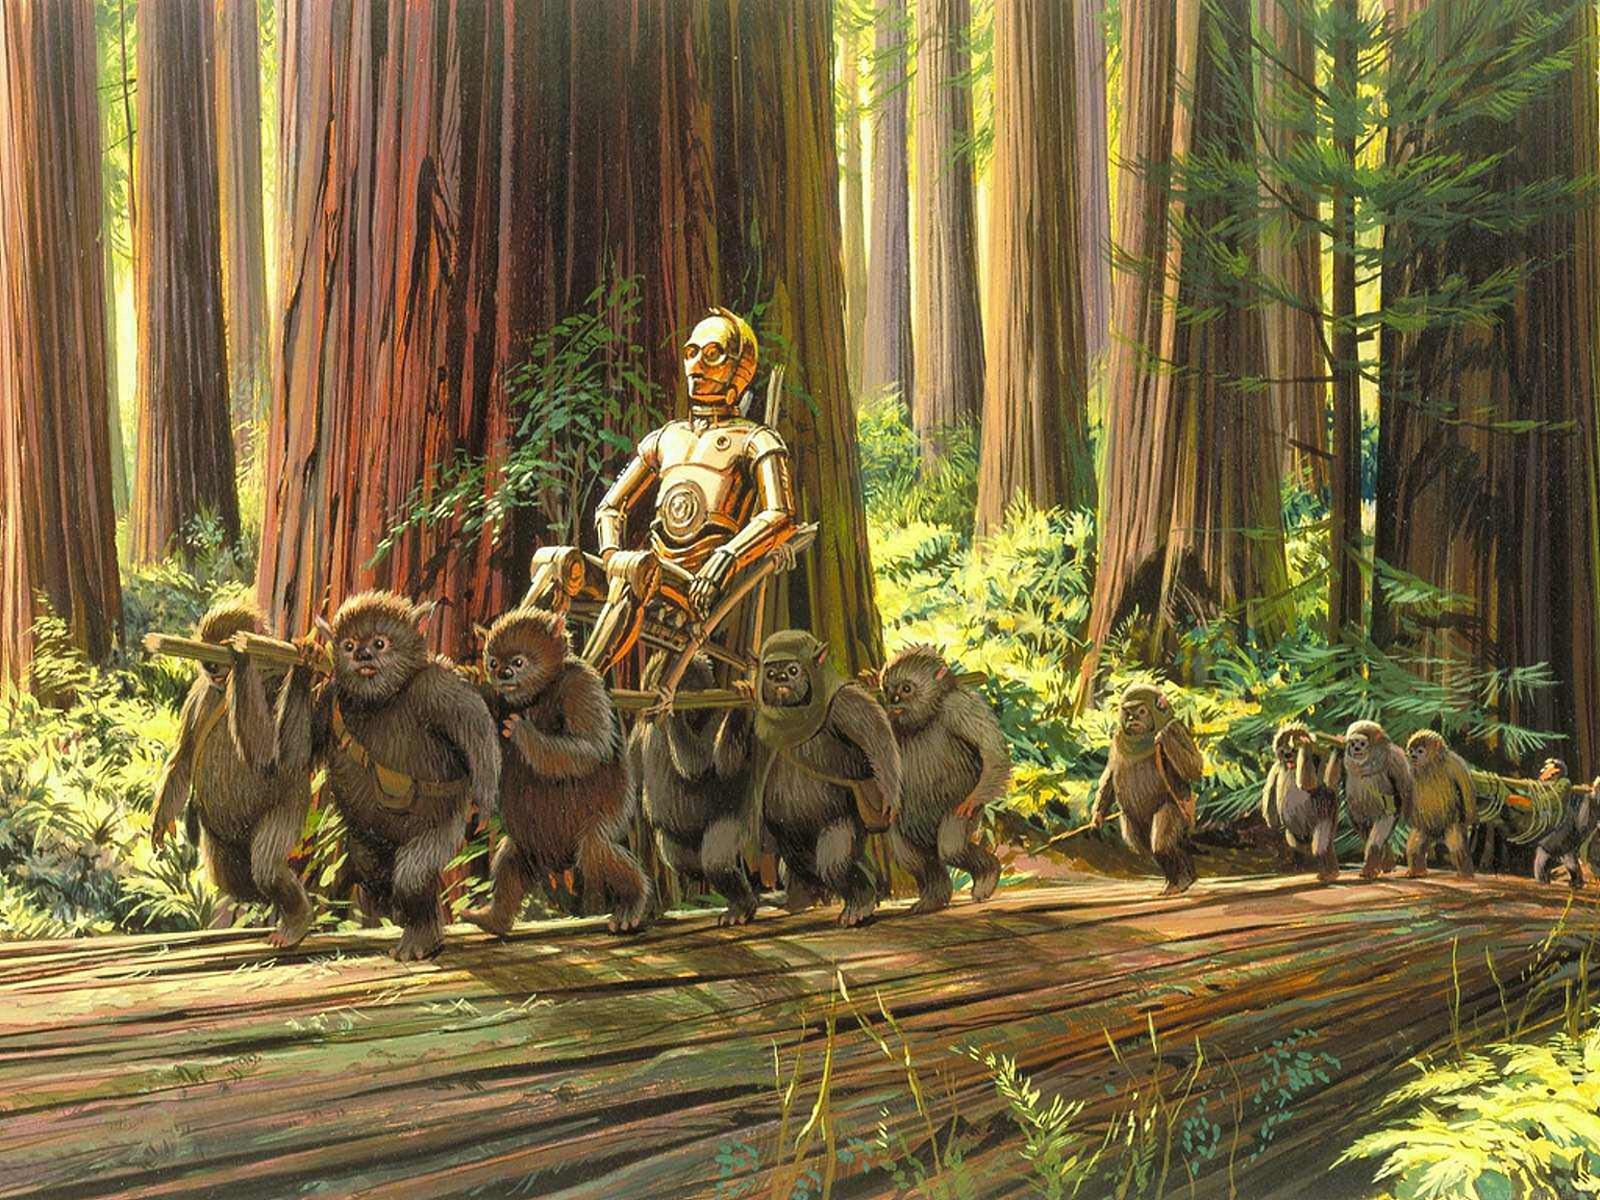 Star Wars Ewok Forest 1061320 Hd Wallpaper Backgrounds Download